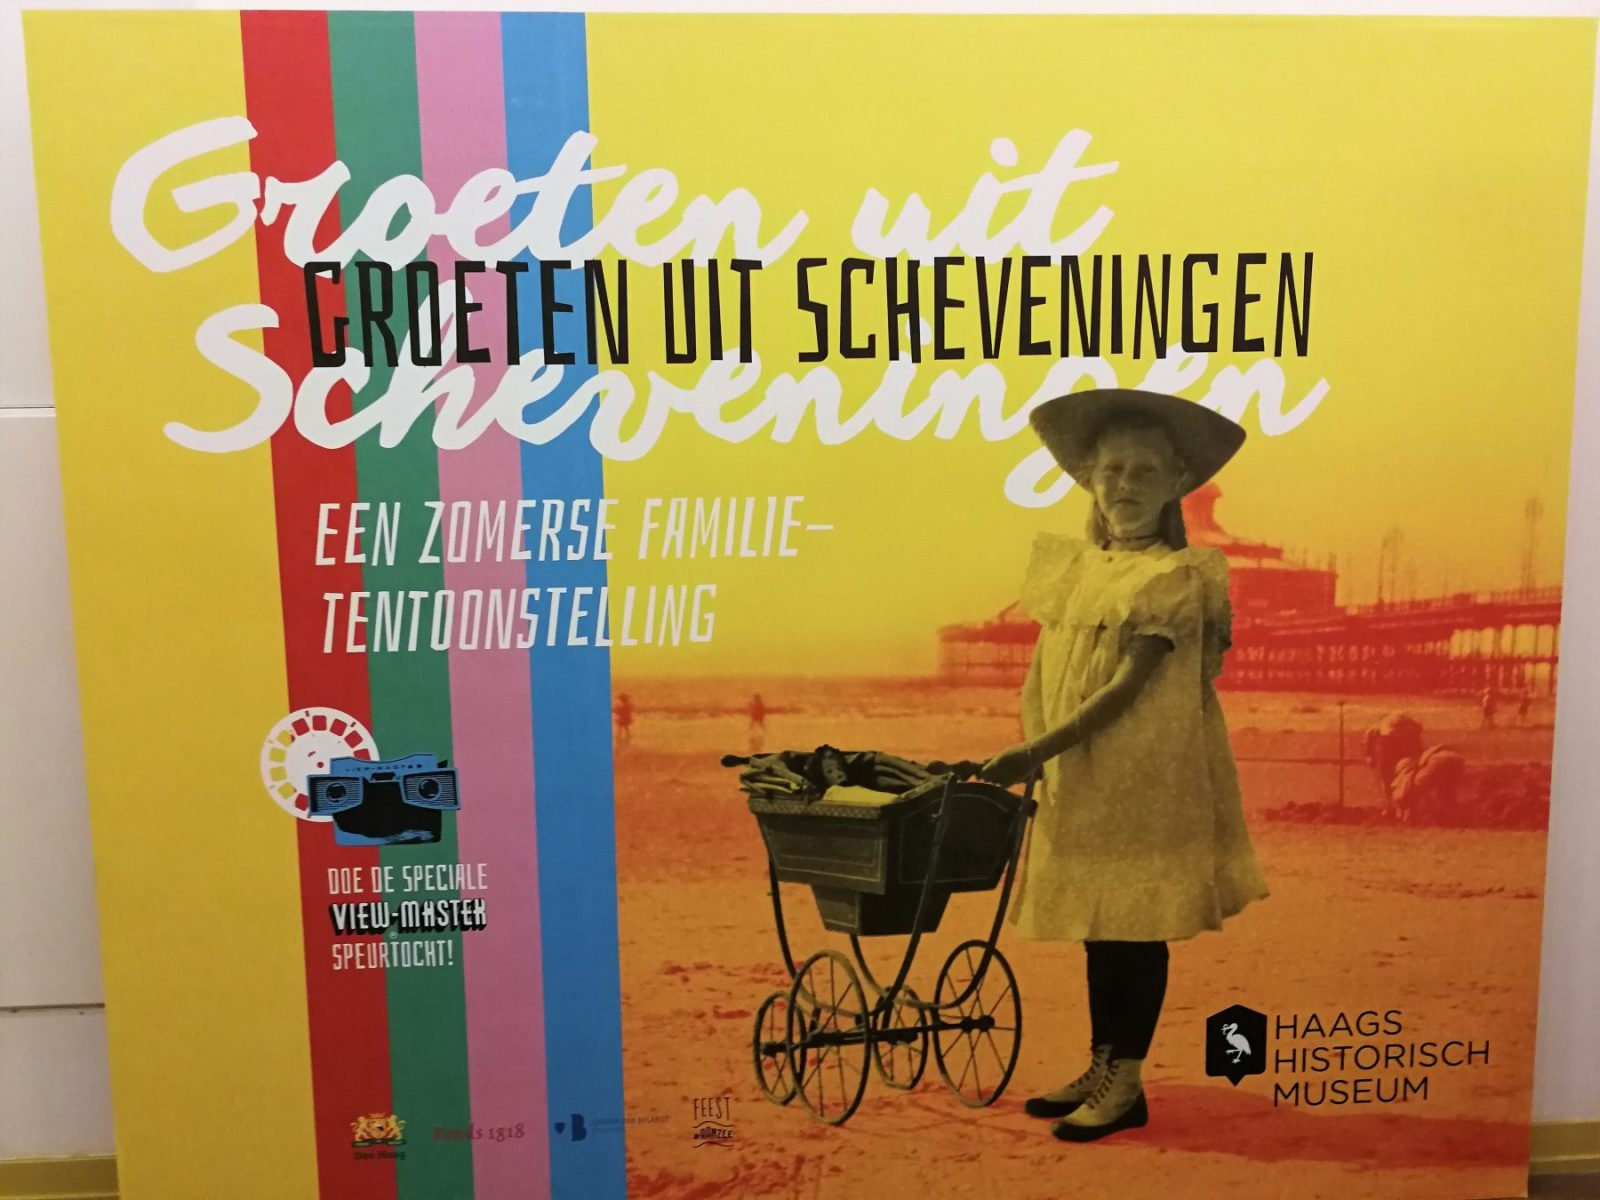 Haags Historisch Museum - Parade